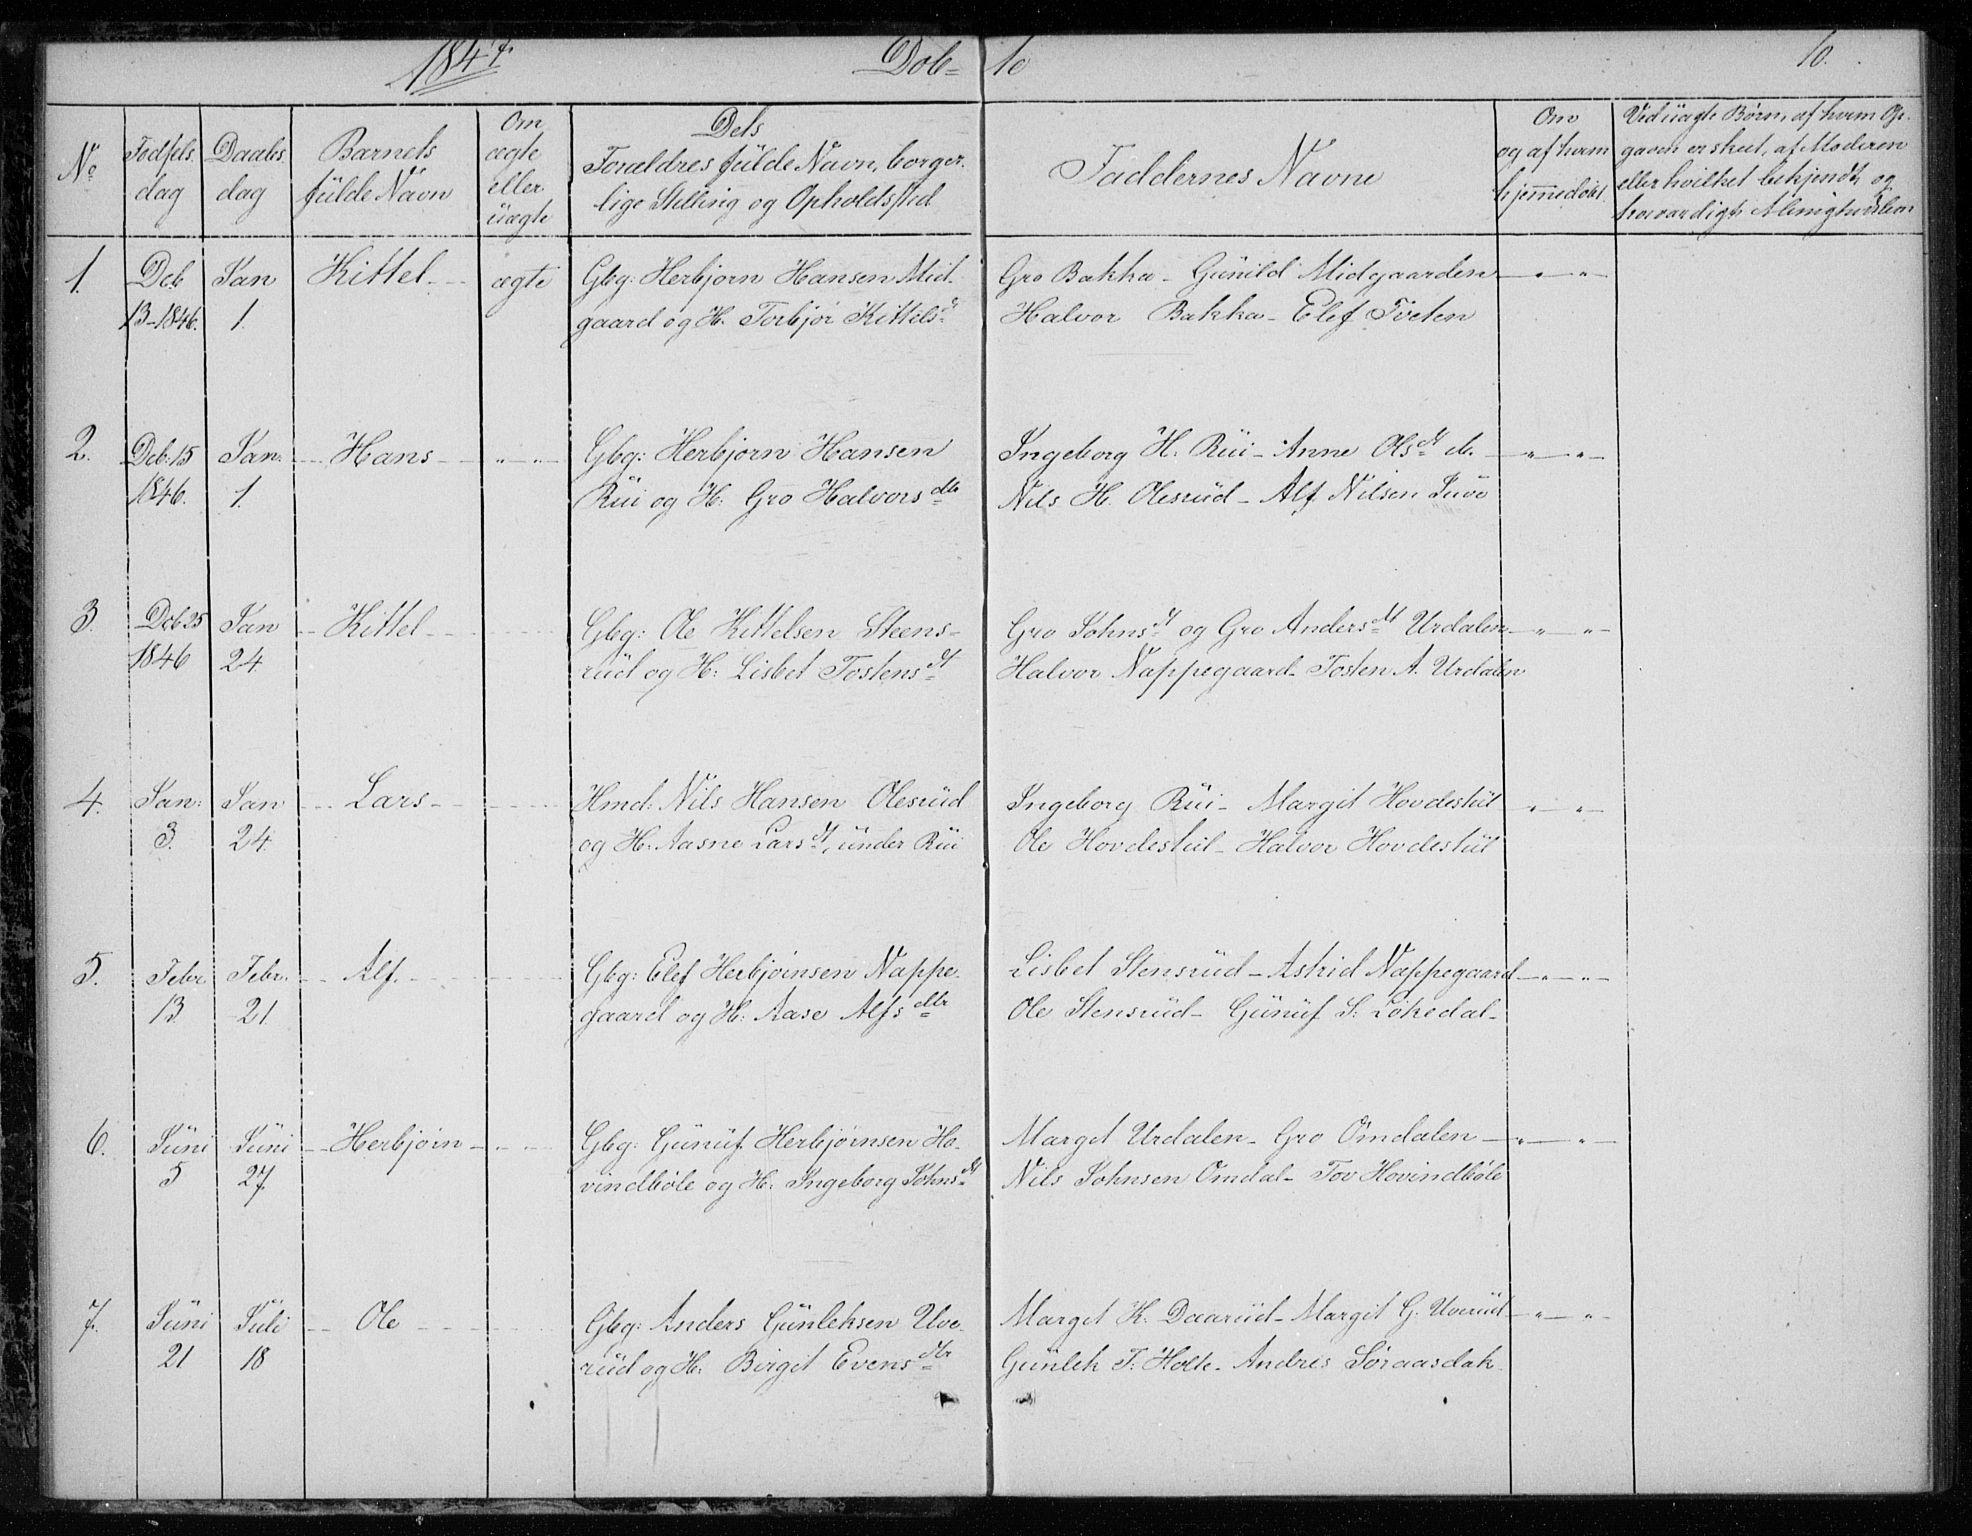 SAKO, Gransherad kirkebøker, F/Fb/L0003: Ministerialbok nr. II 3, 1844-1859, s. 10